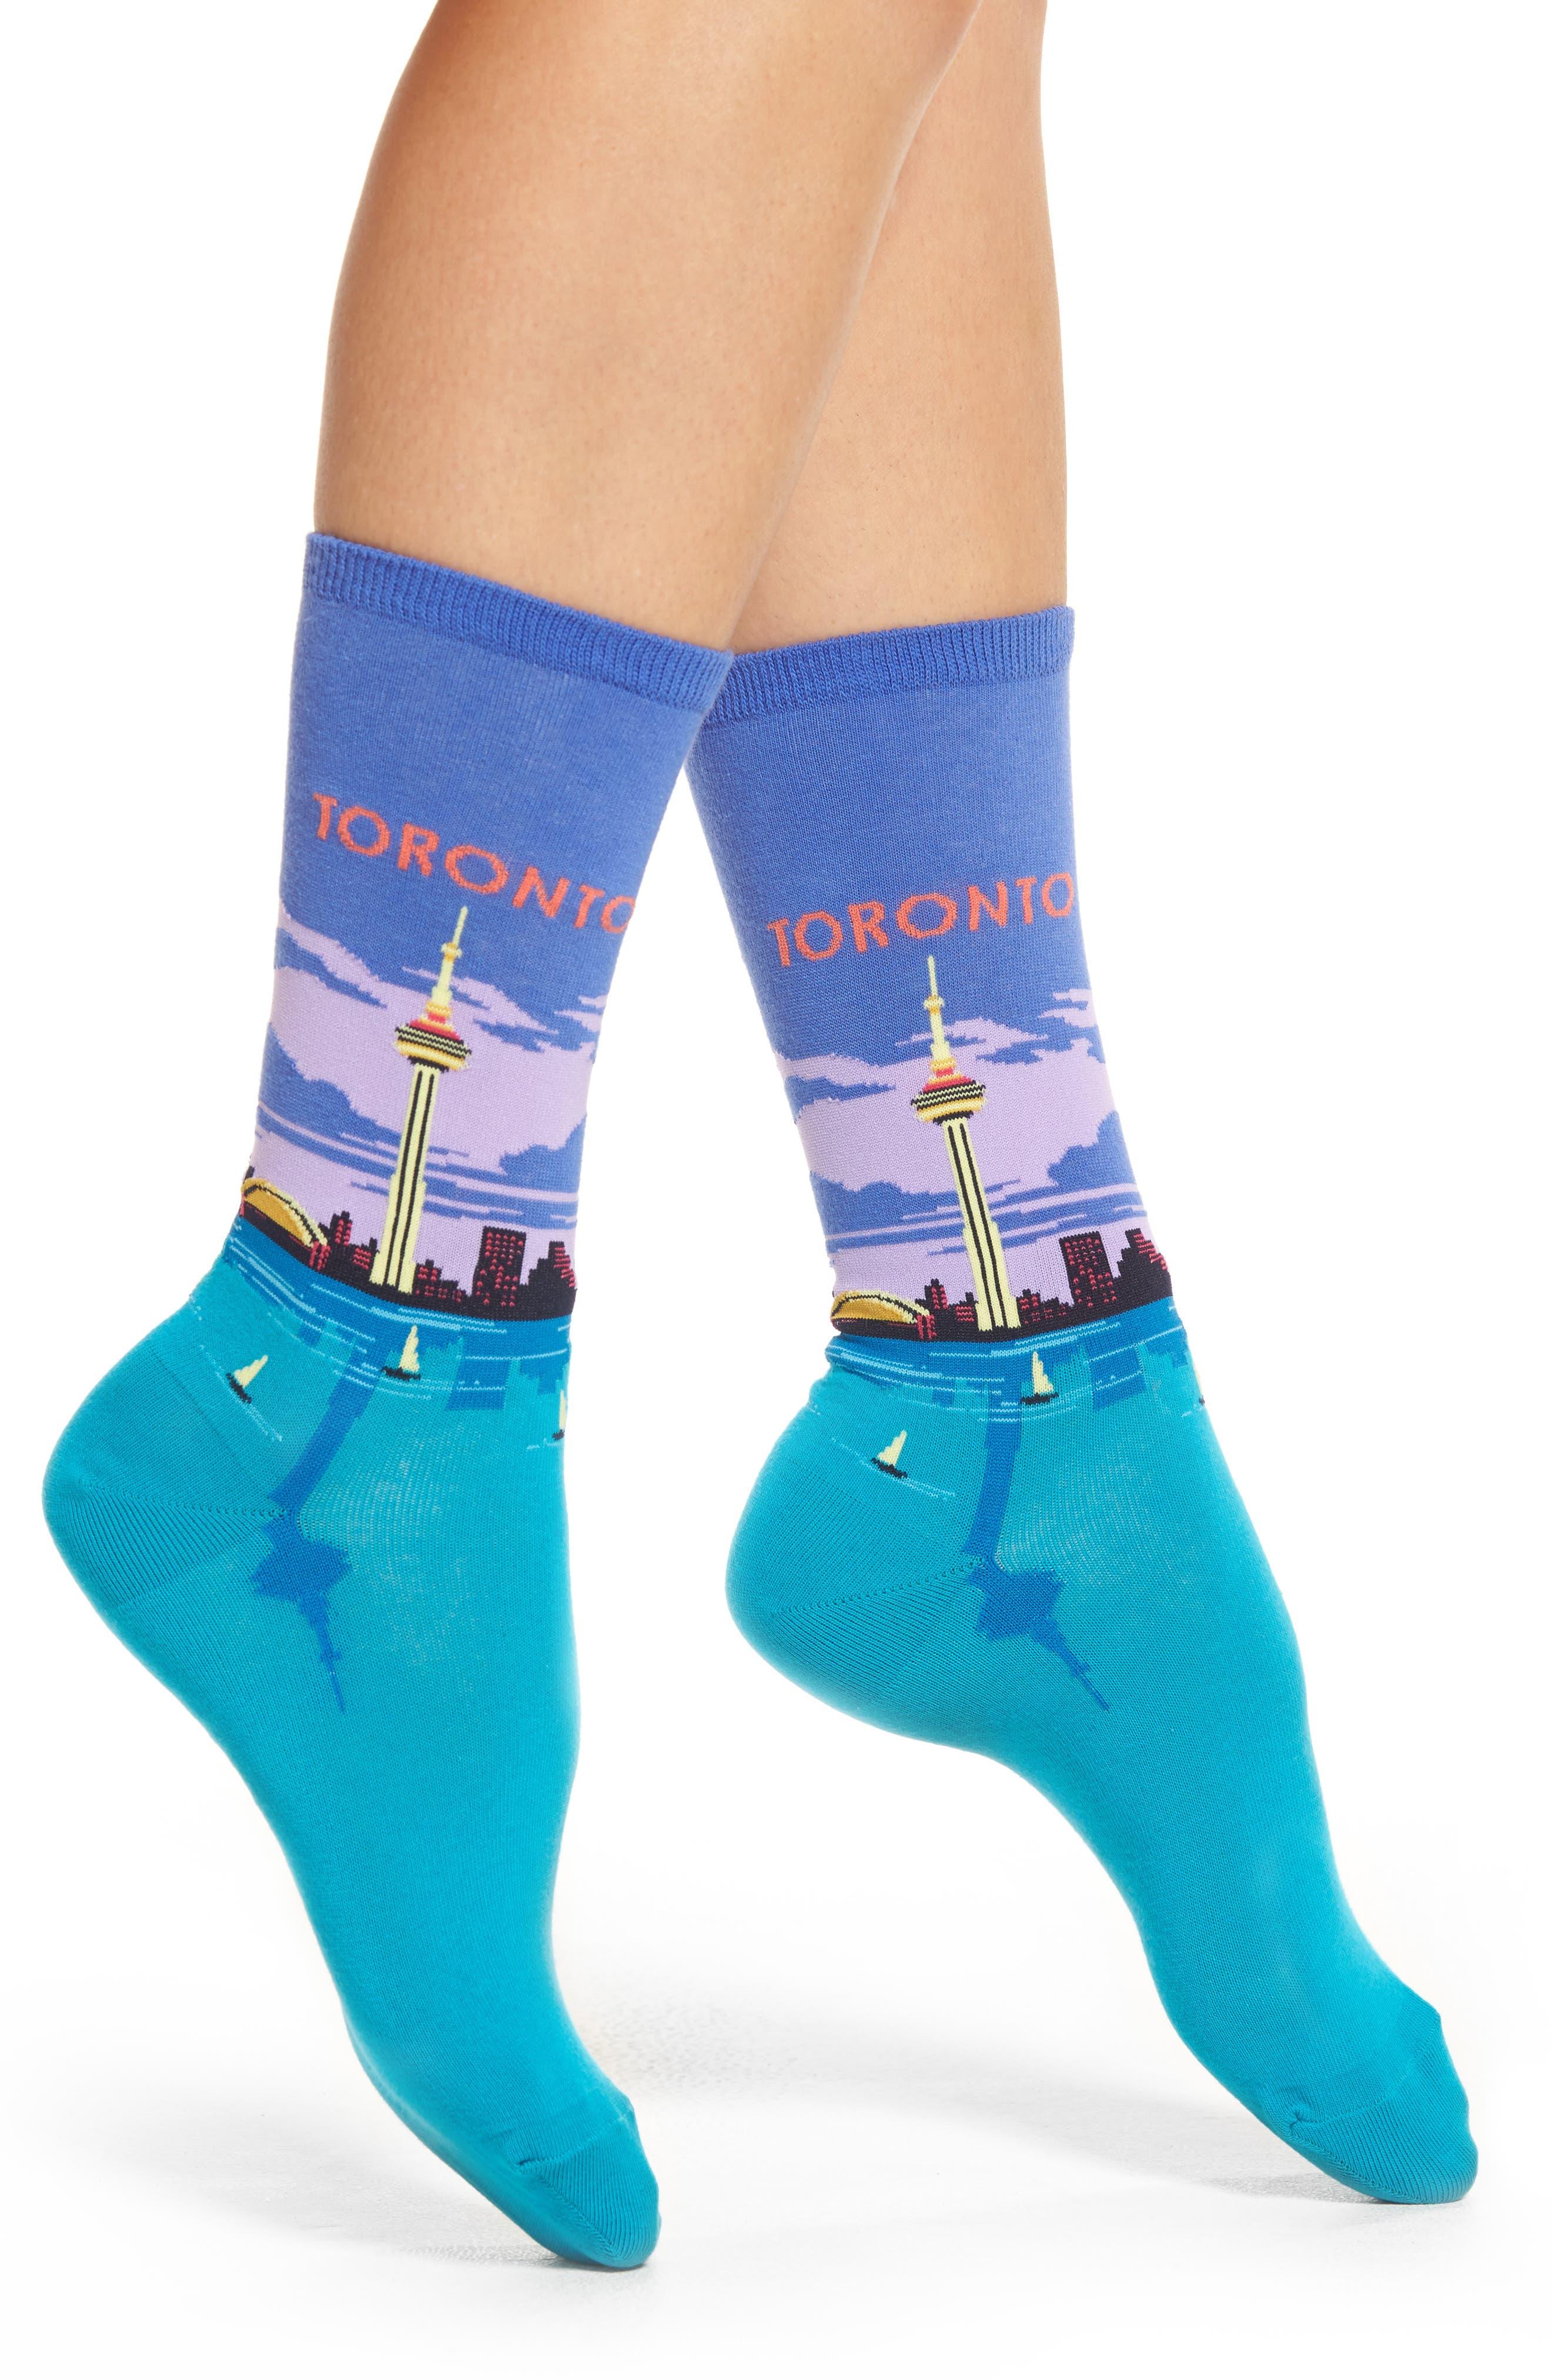 Toronto Crew Socks,                             Main thumbnail 1, color,                             Blue